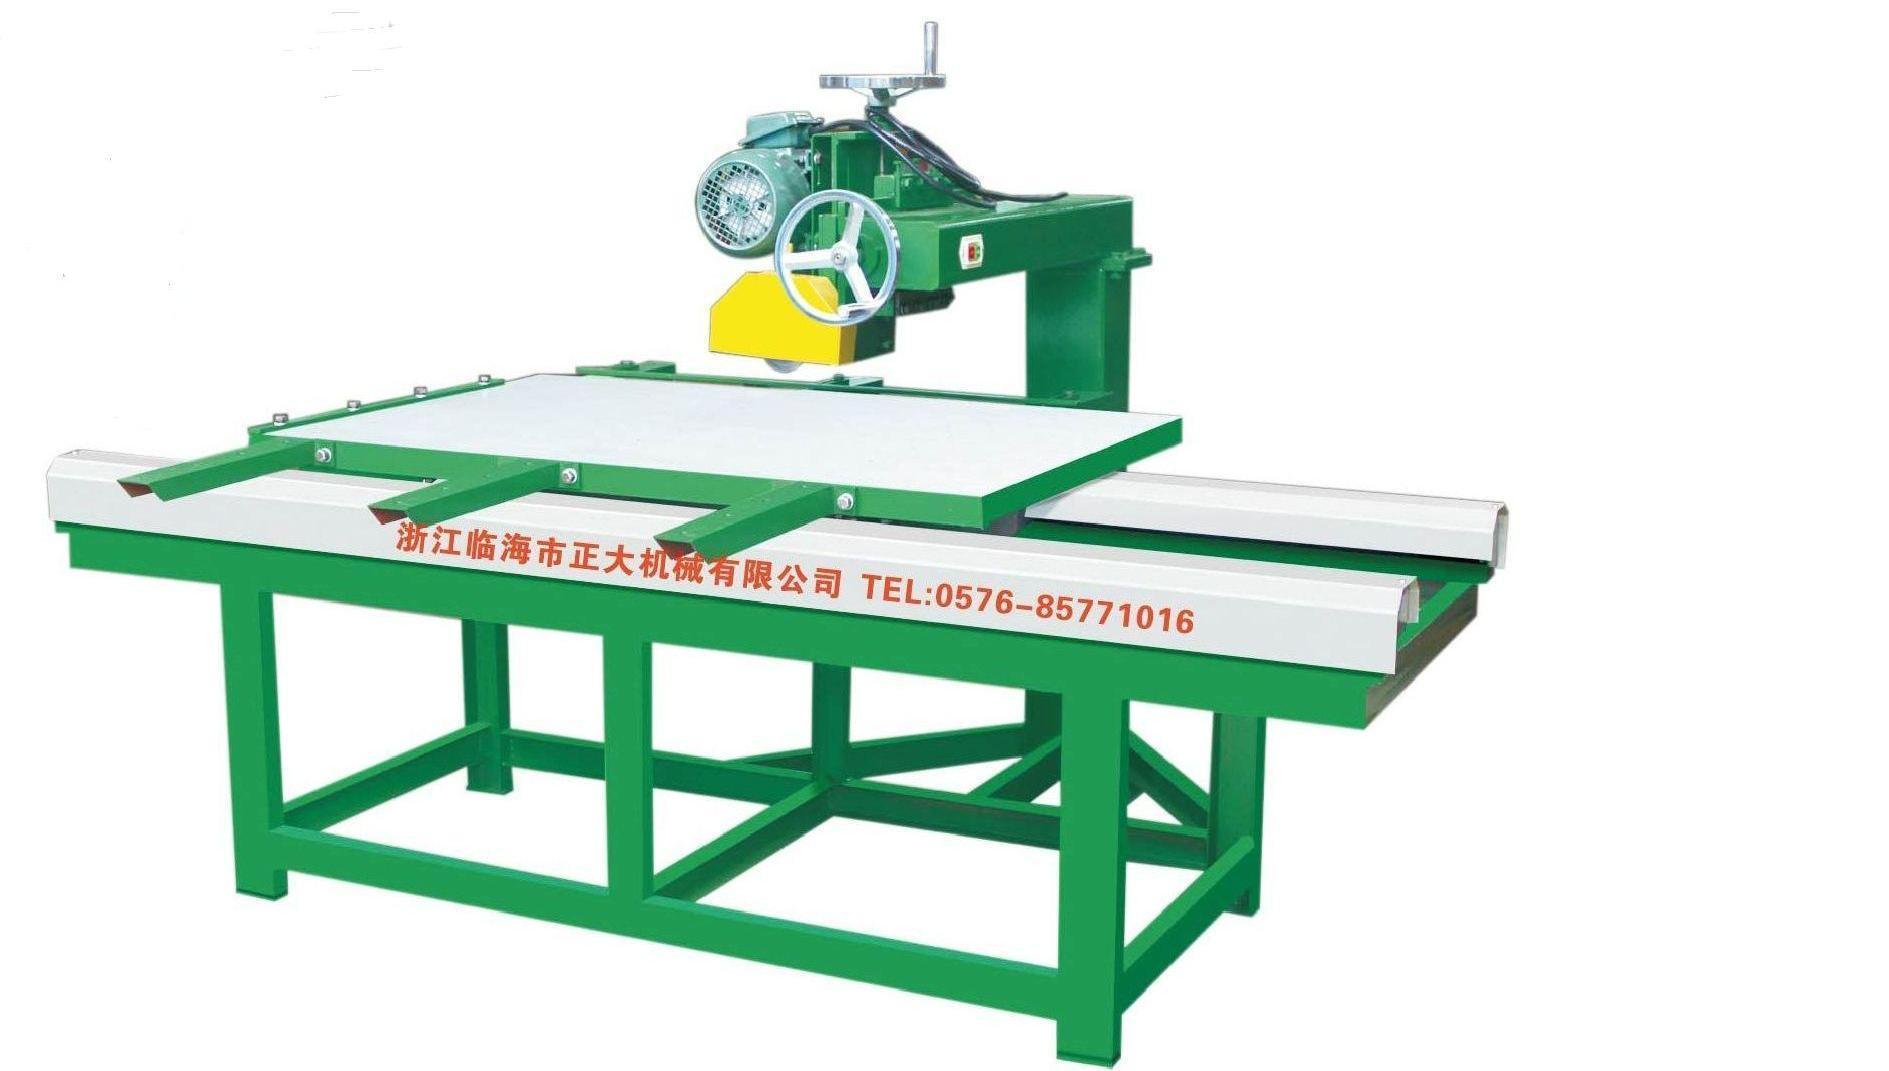 China ceramic tile cutting machine by manual zdc 1200 photos ceramic tile cutting machine by manual zdc 1200 dailygadgetfo Images